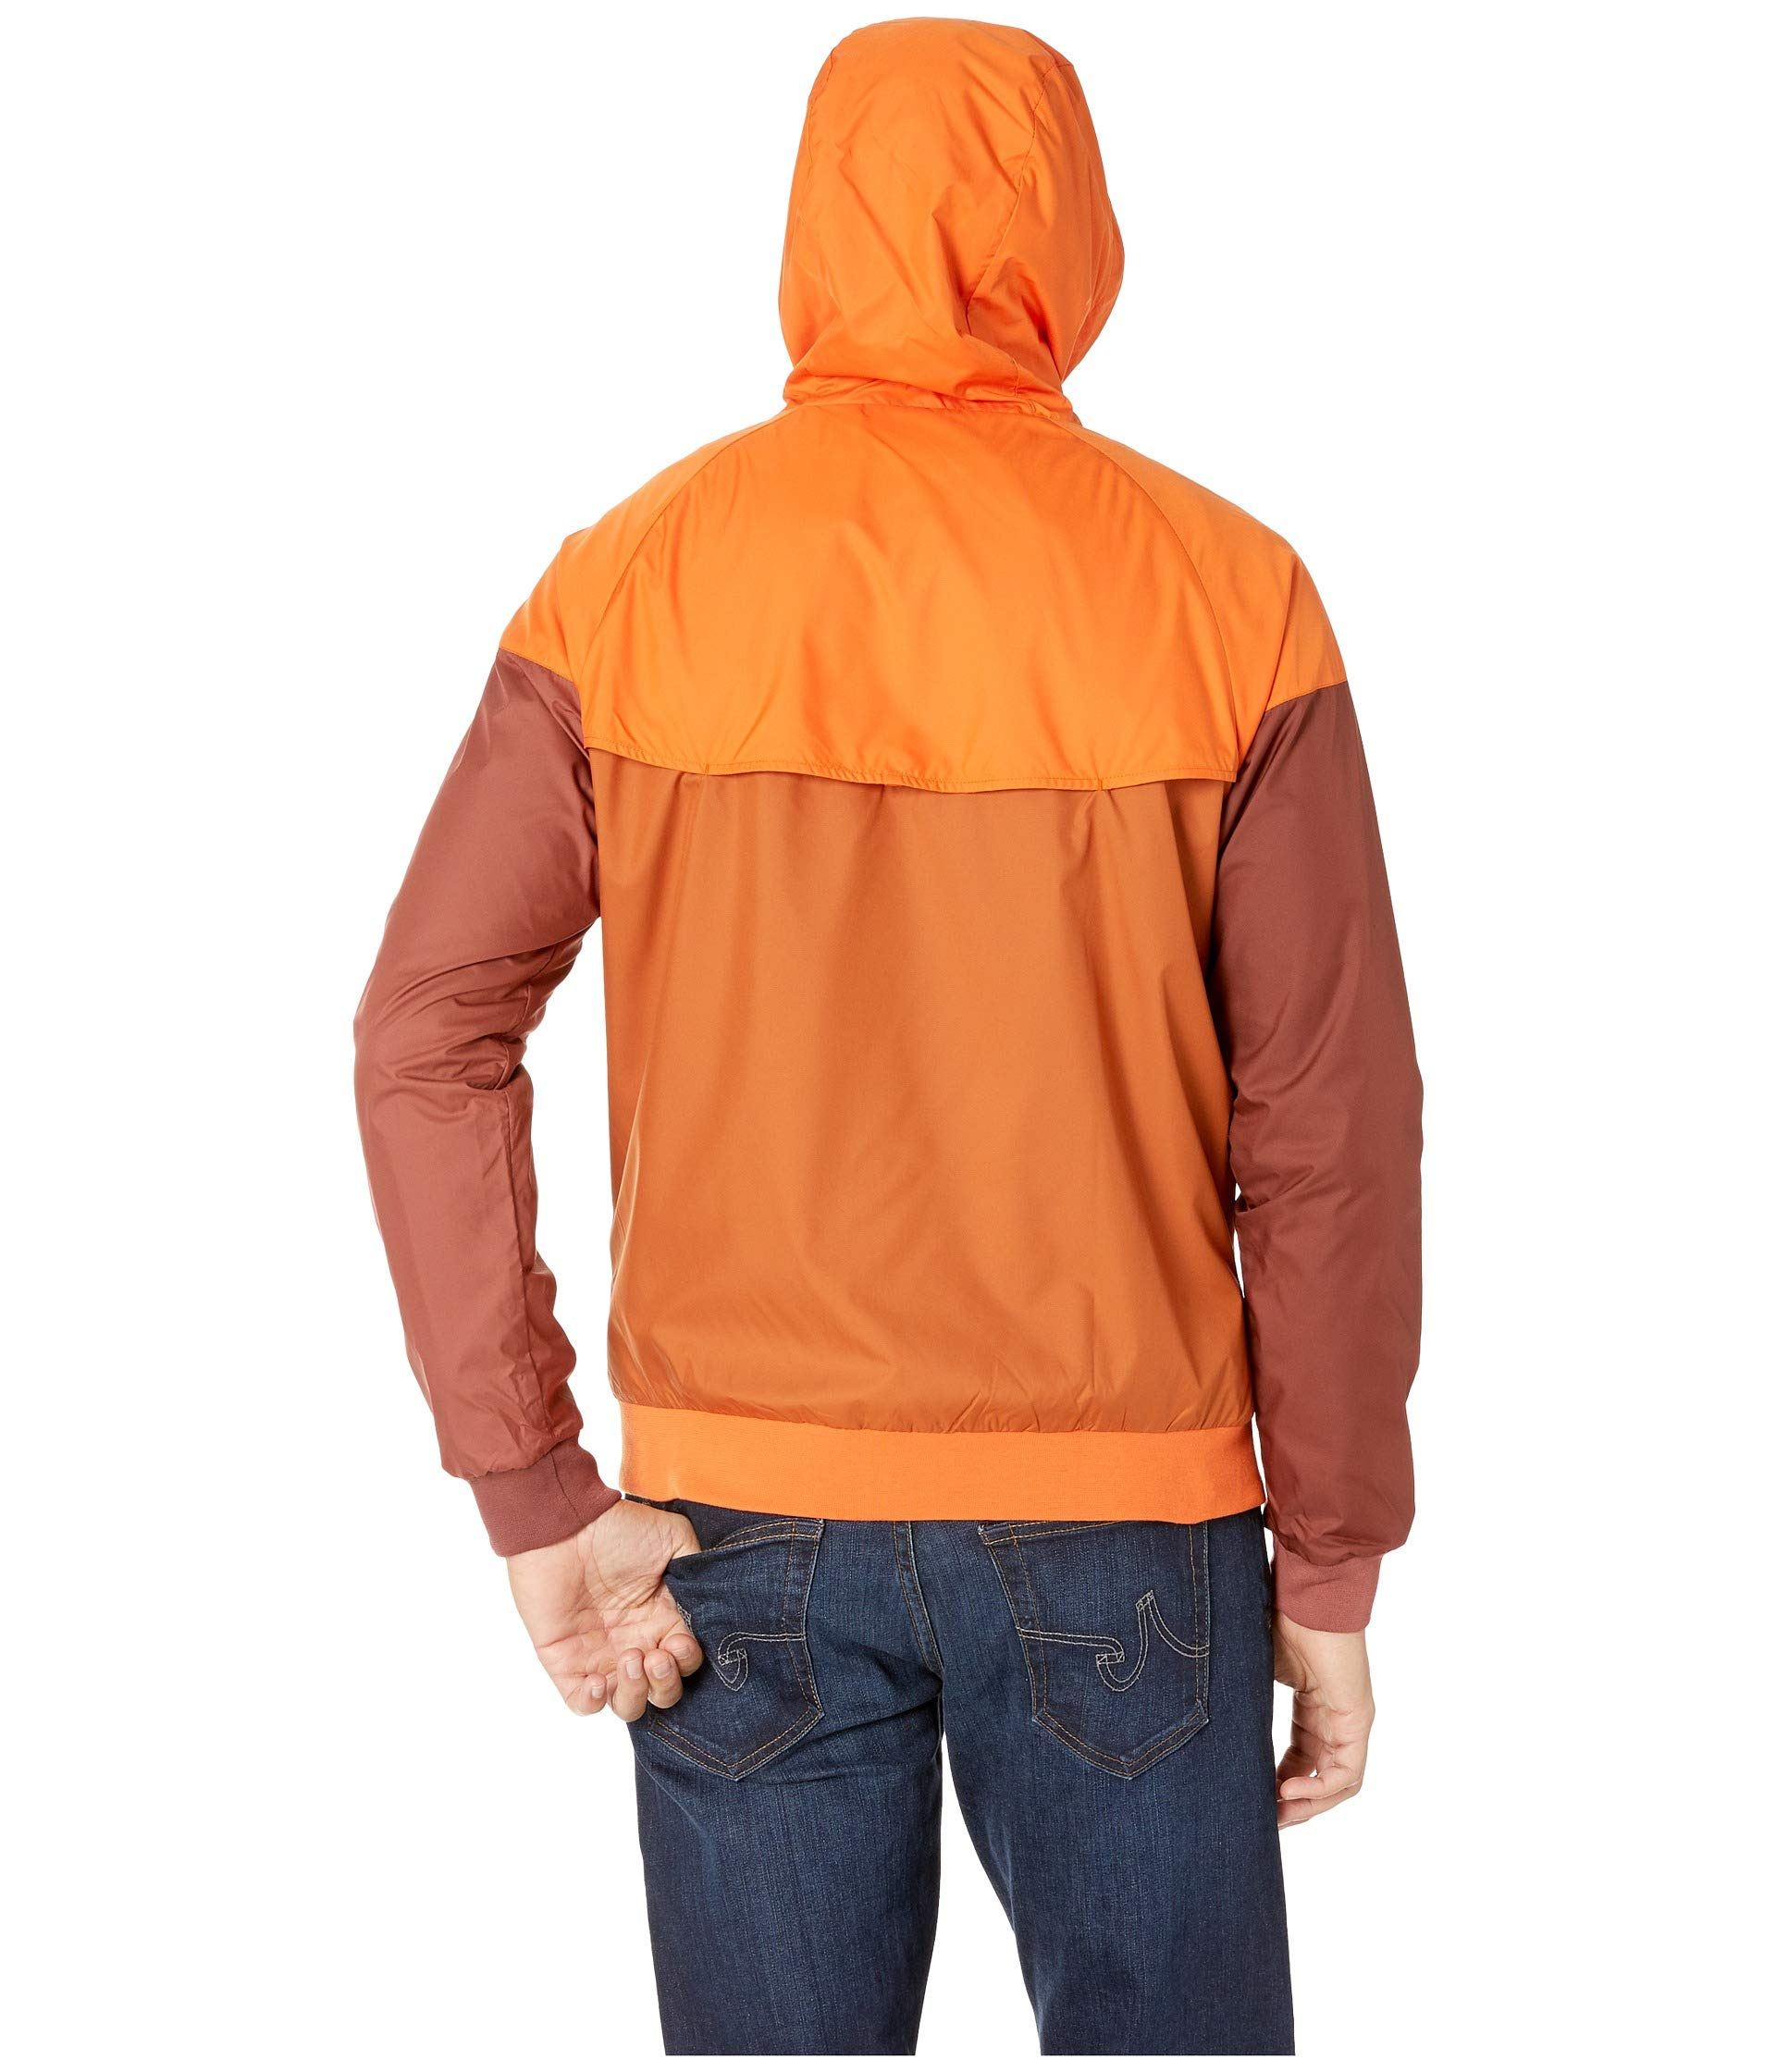 Nike Men's Windrunner Full Zip Jacket (Cmpfre Ornge/Dk Russet/Small) by Nike (Image #4)